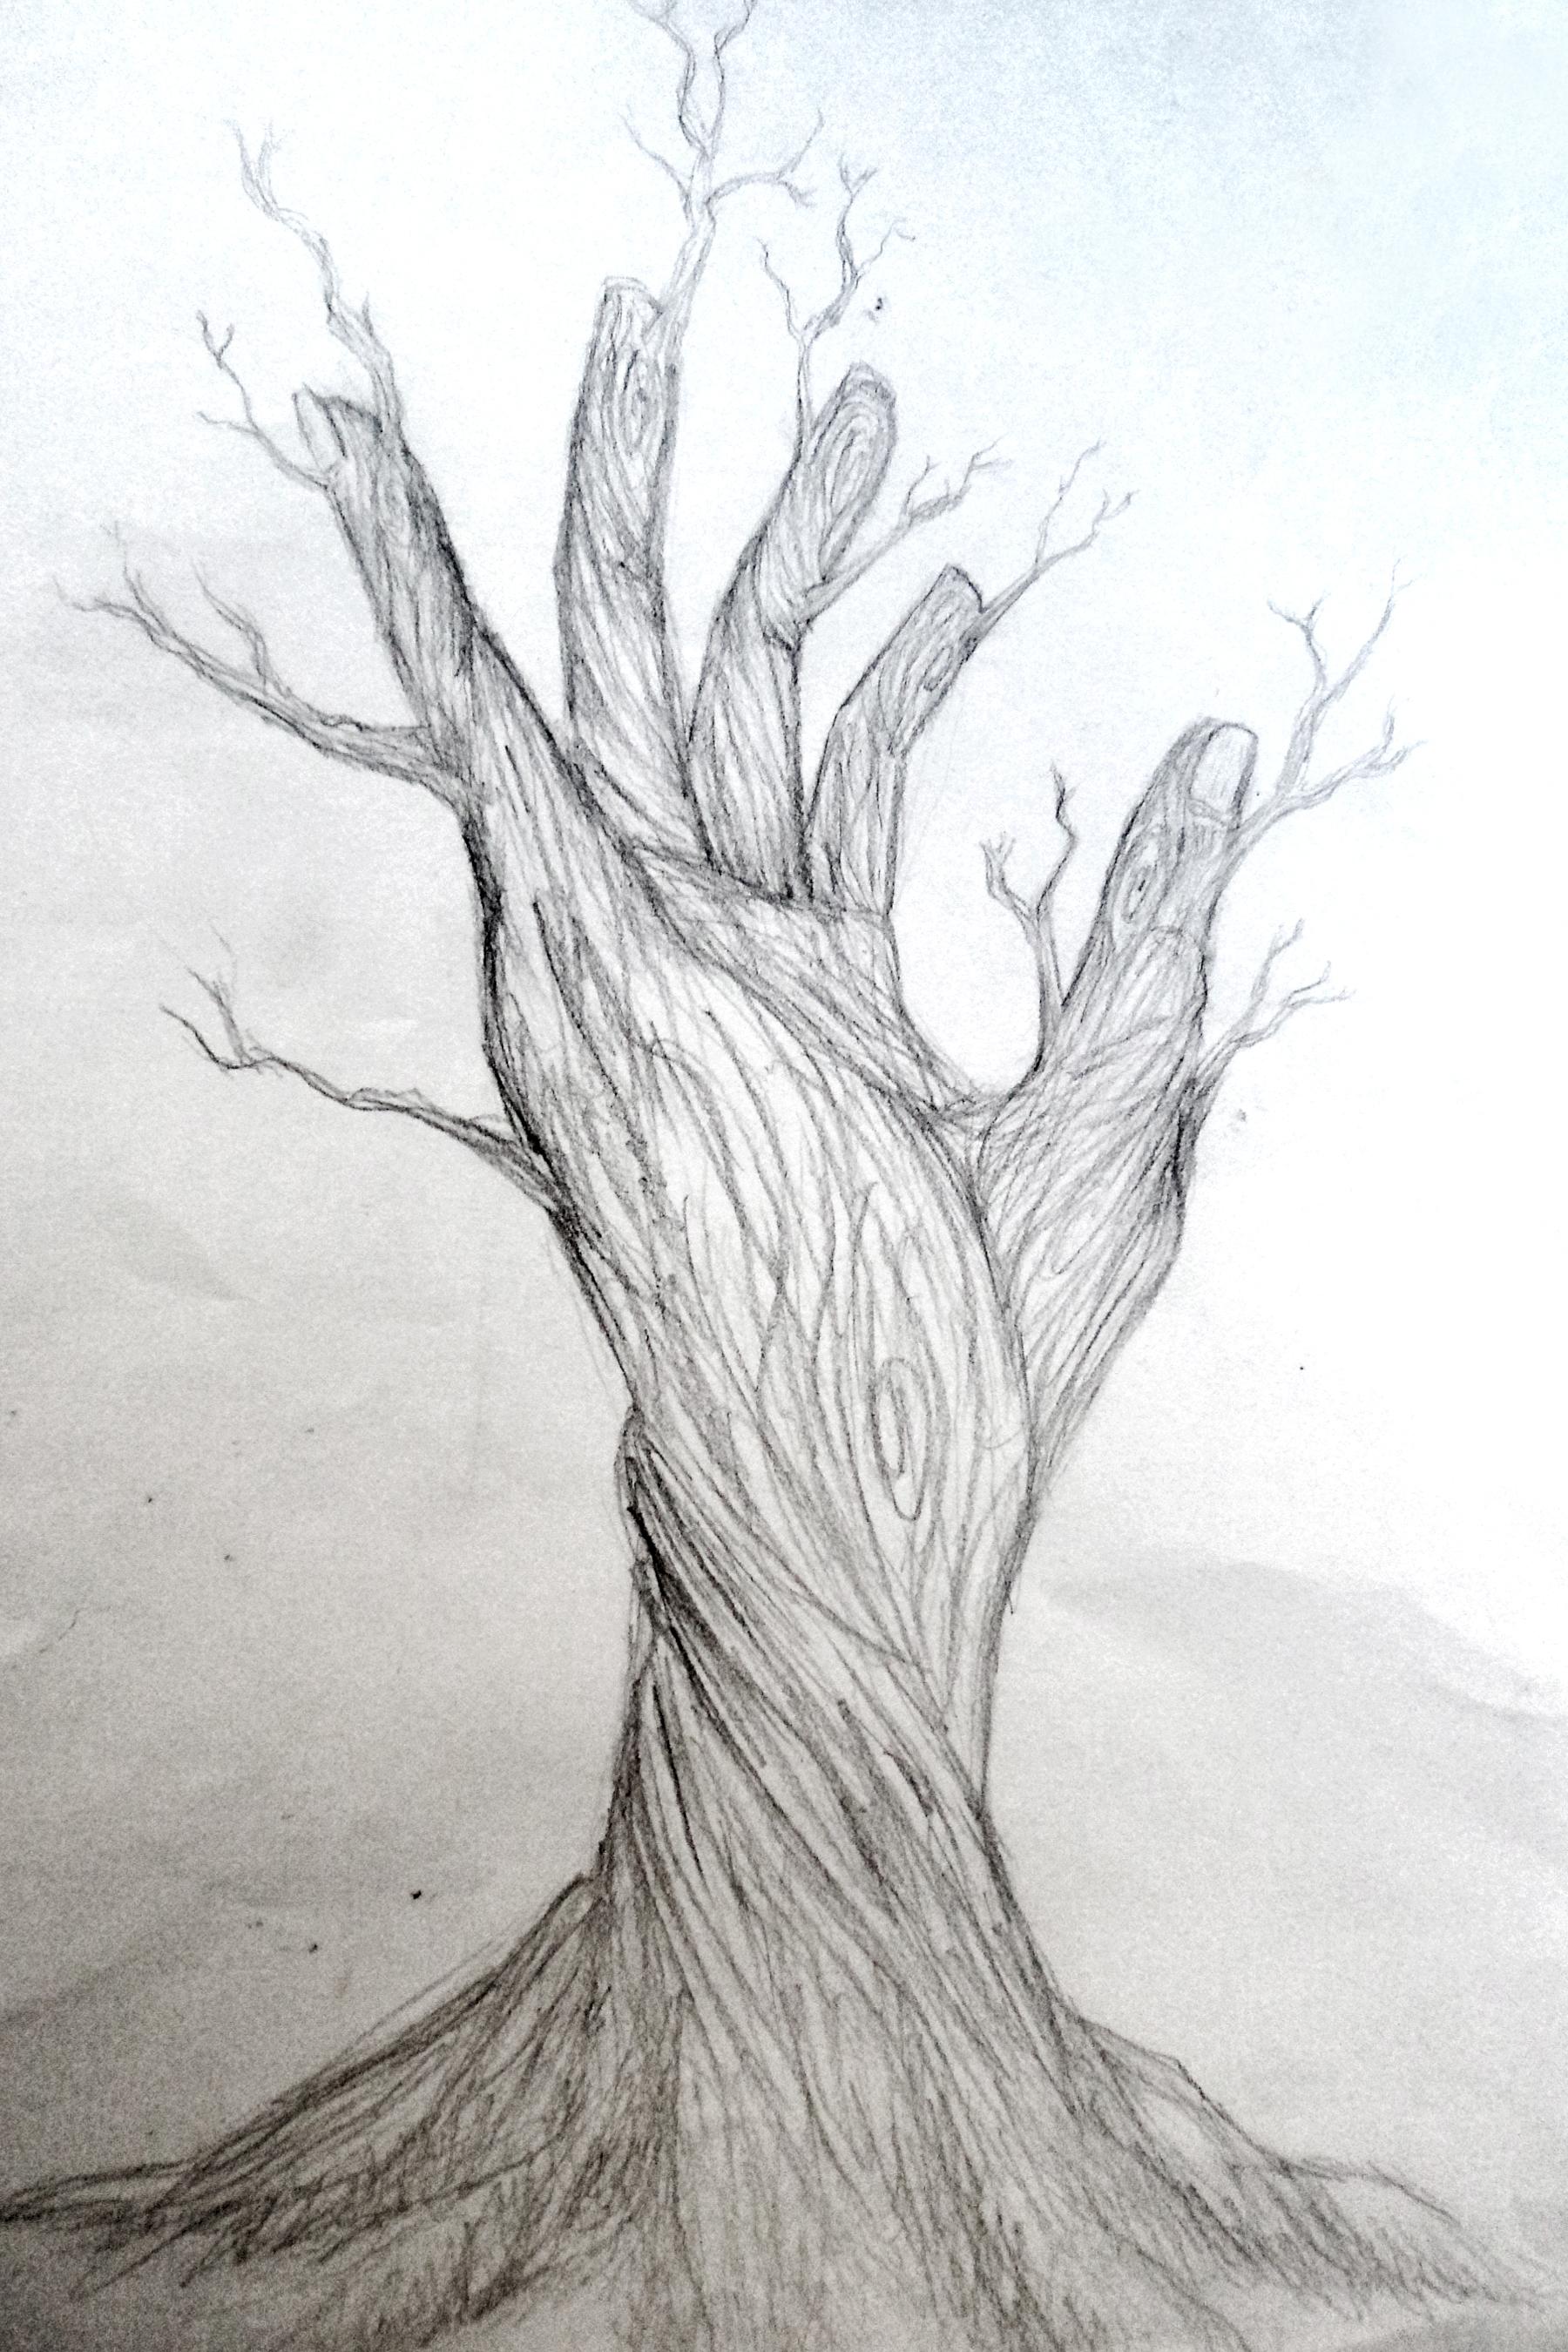 Hybrid Nature by FATALxFRAME on DeviantArt